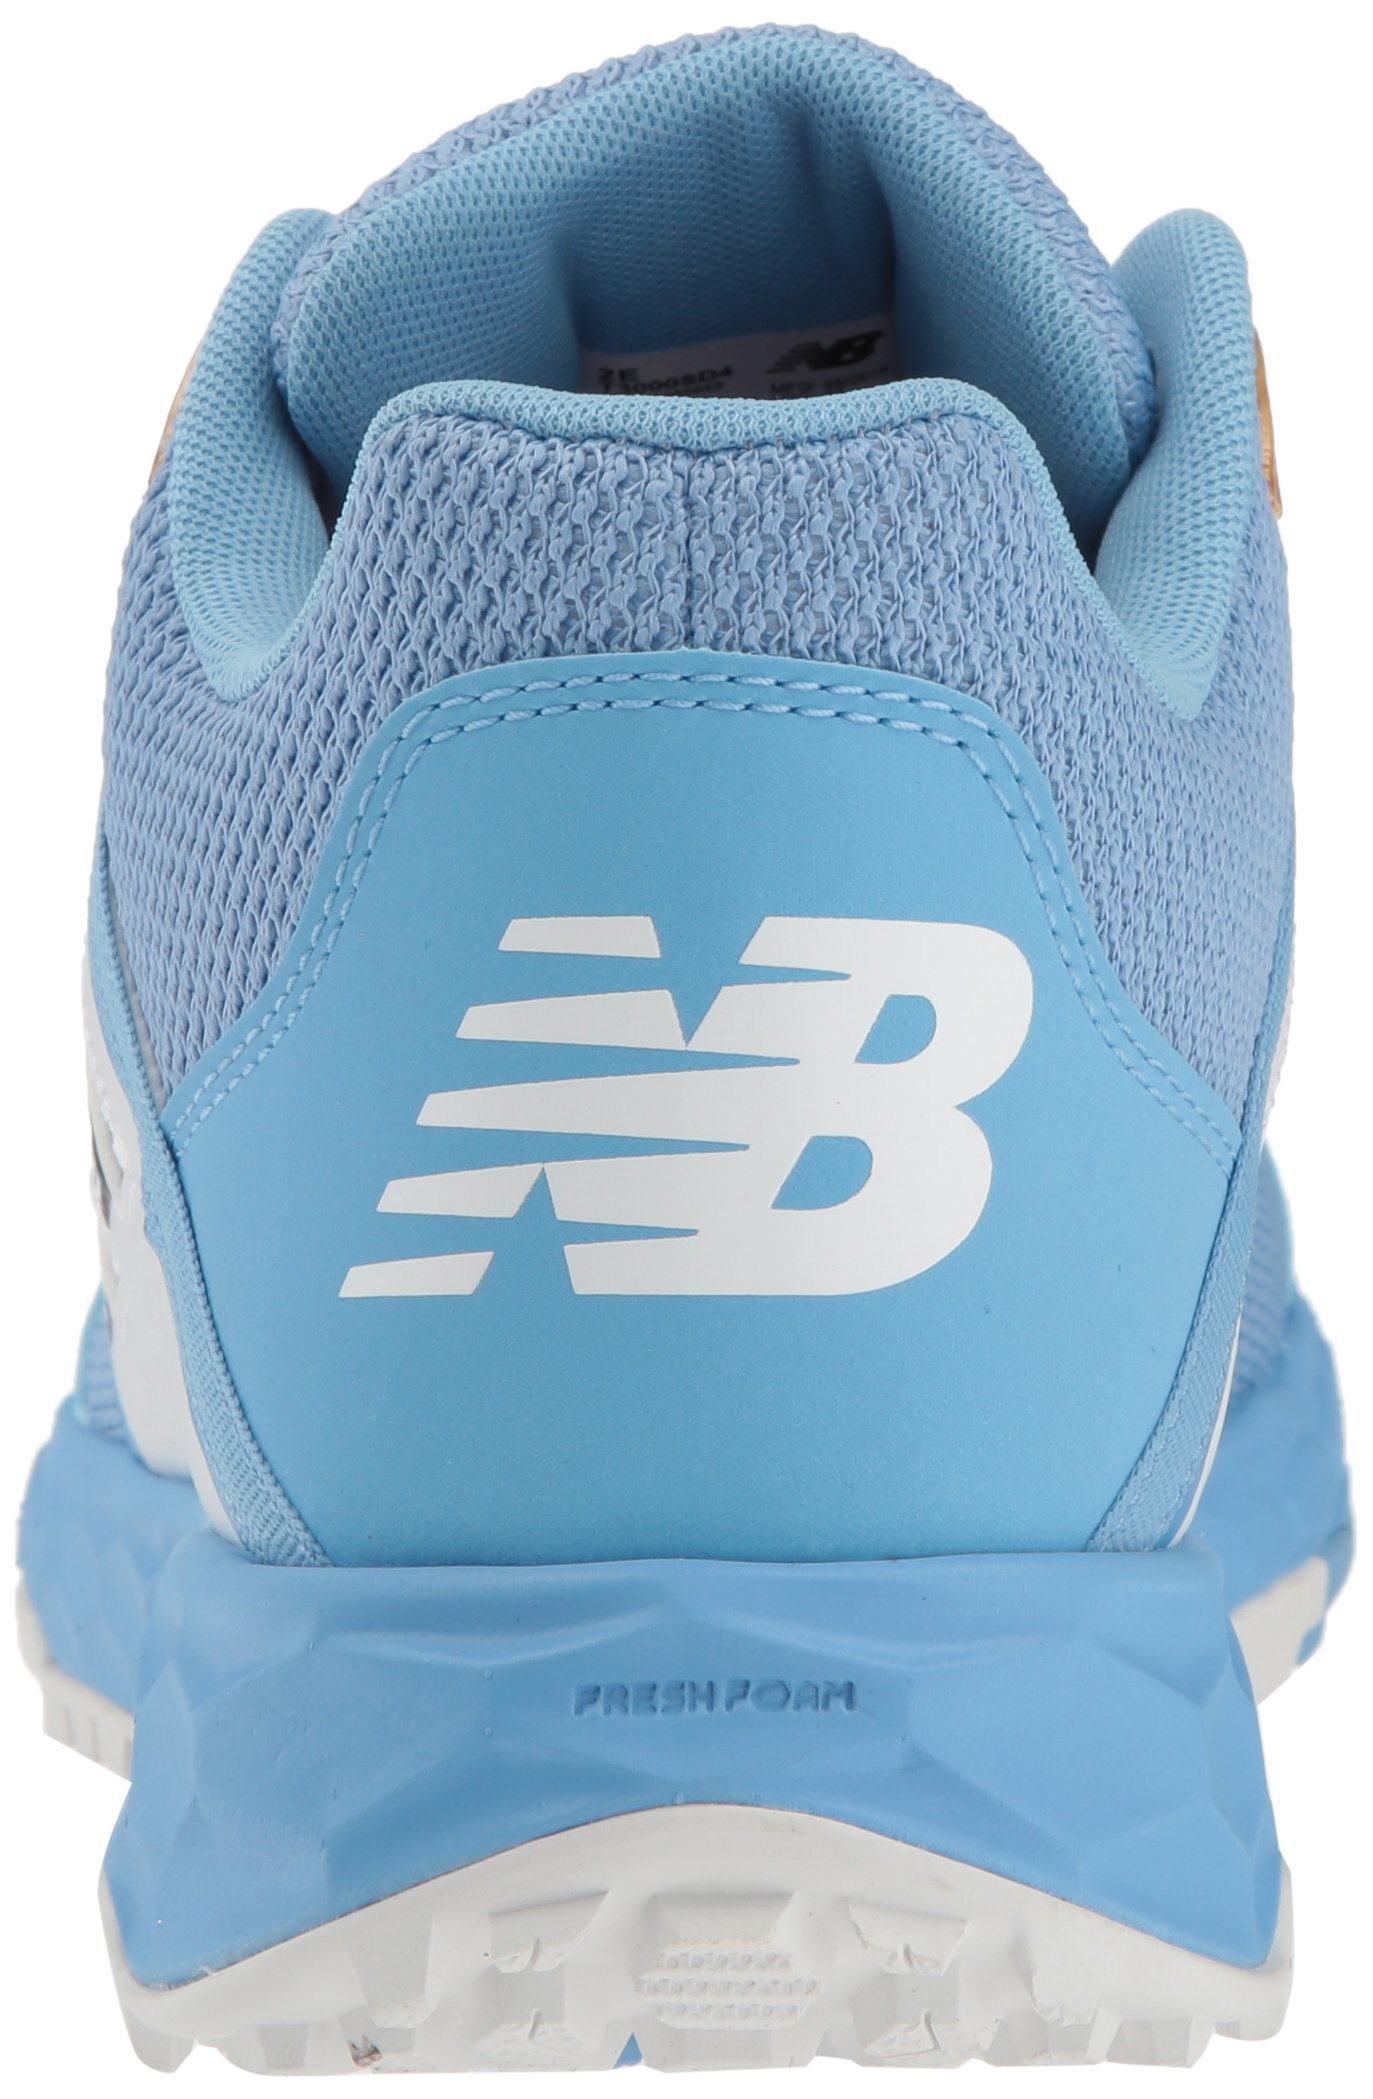 New Balance Men's 3000v4 Turf Baseball Shoe, Light Blue, 5 D US by New Balance (Image #2)